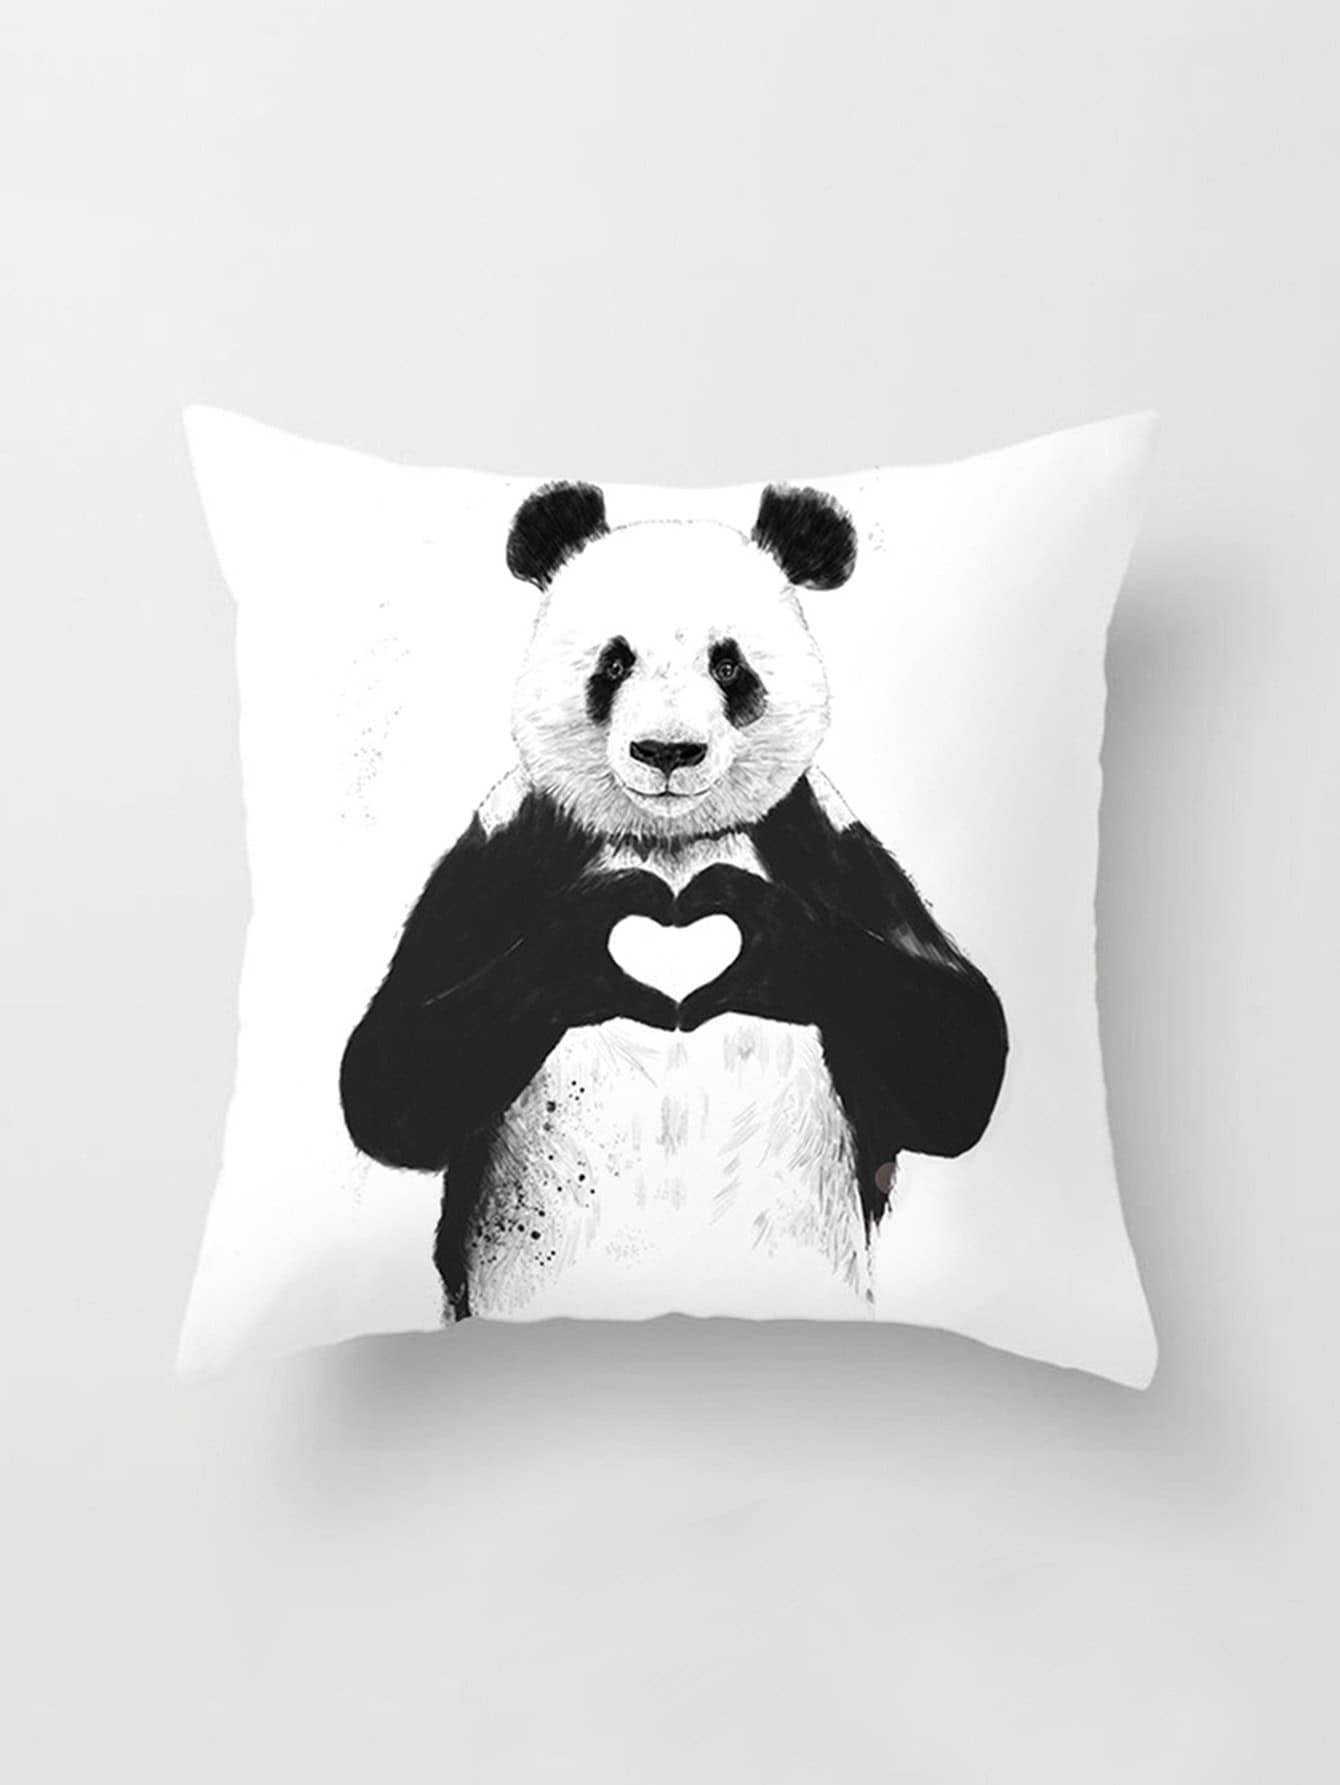 Panda Print Linen Pillowcase Cover panda print linen pillowcase cover